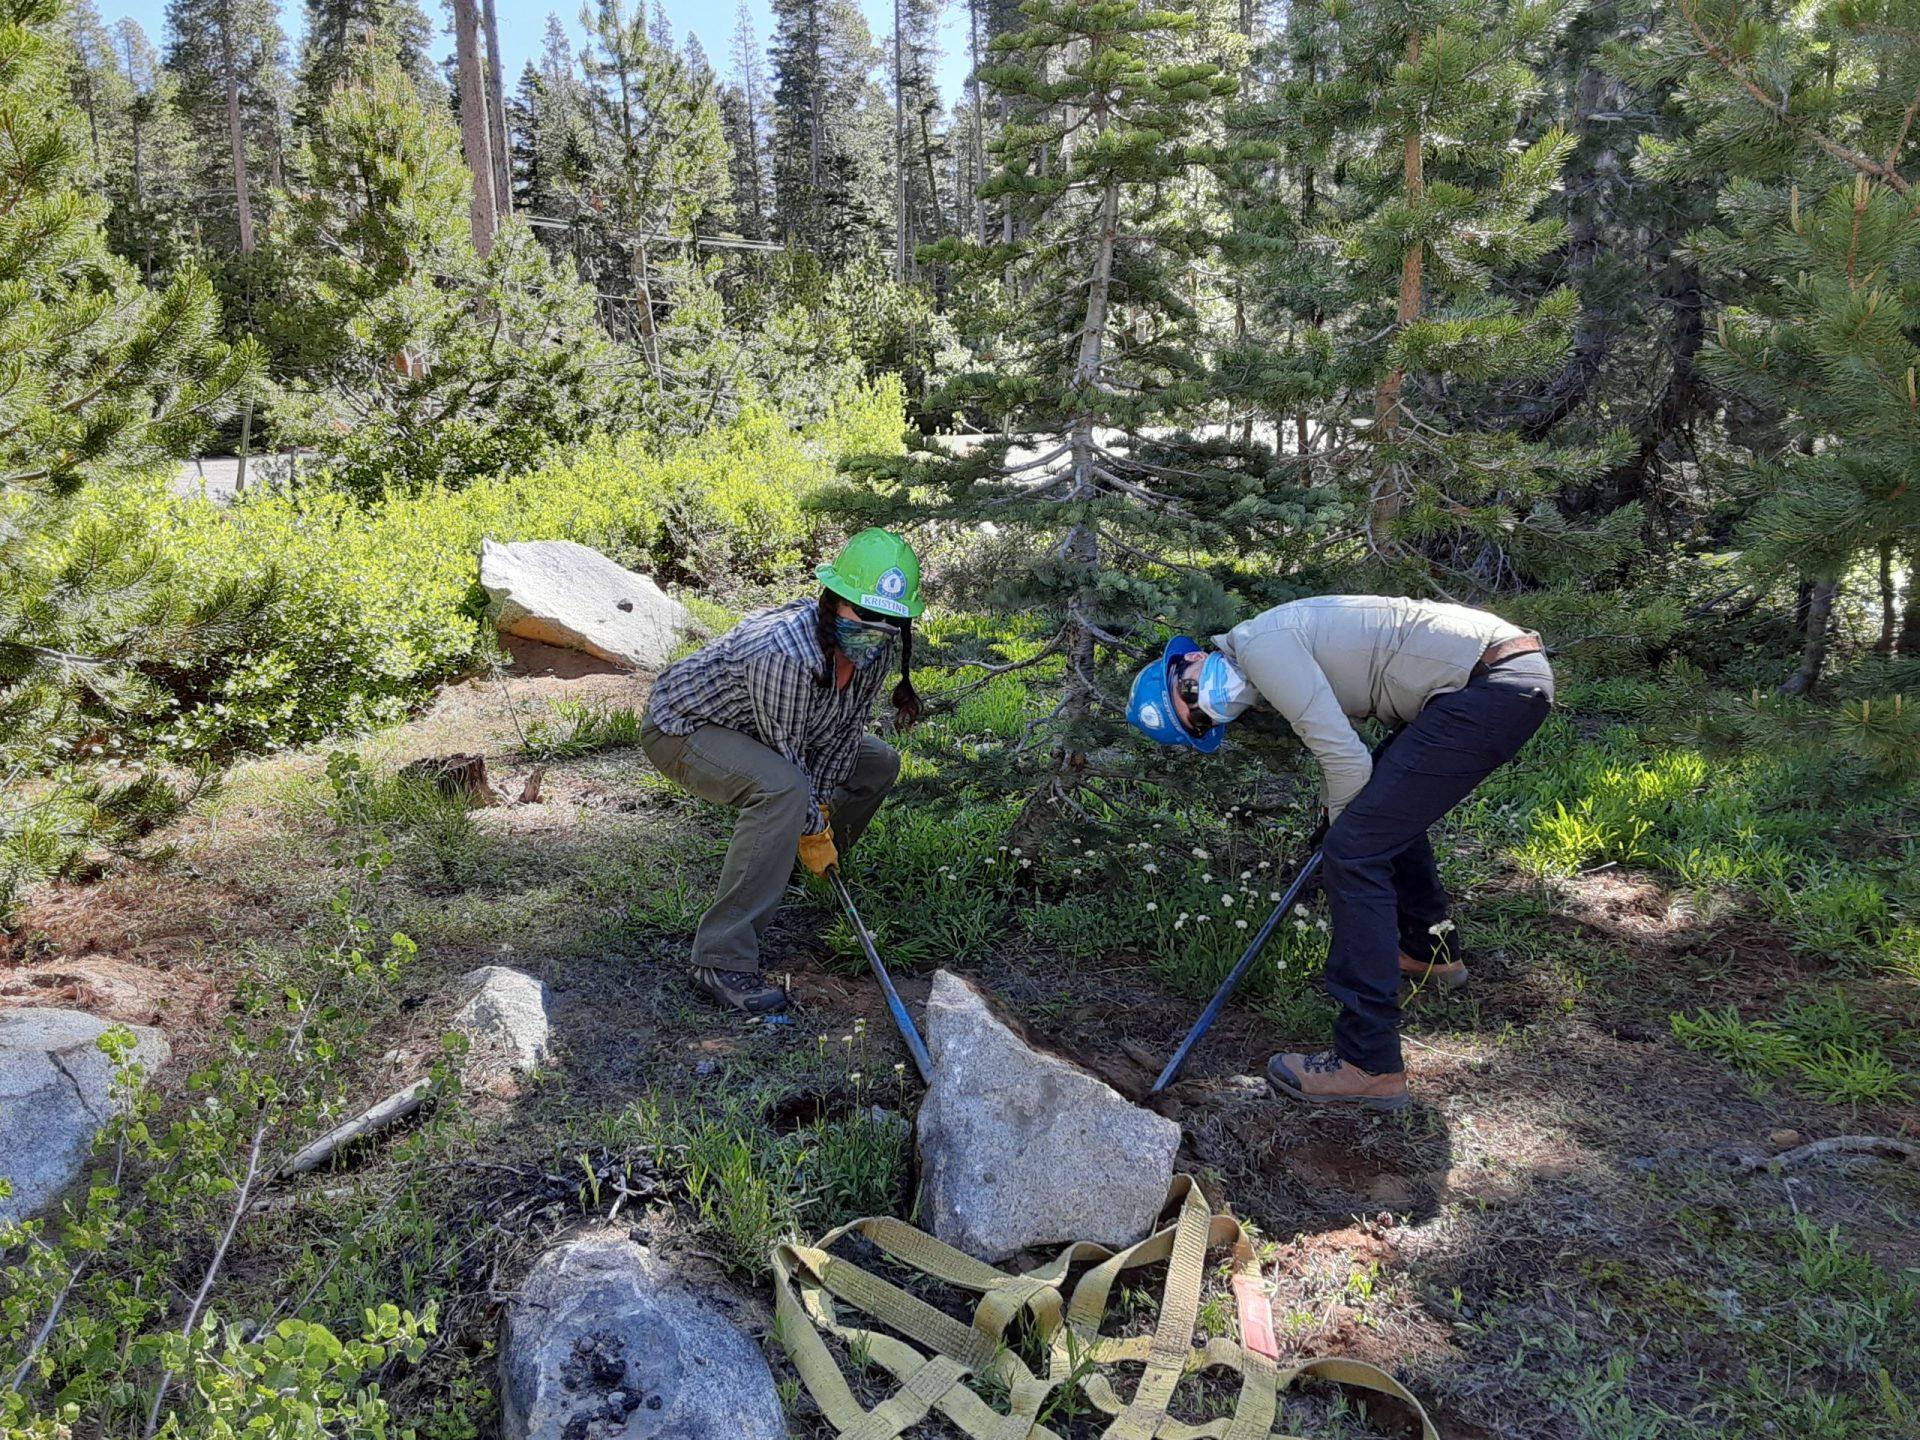 TRTA staff work on trail maintenance. Image: Morgan Steel